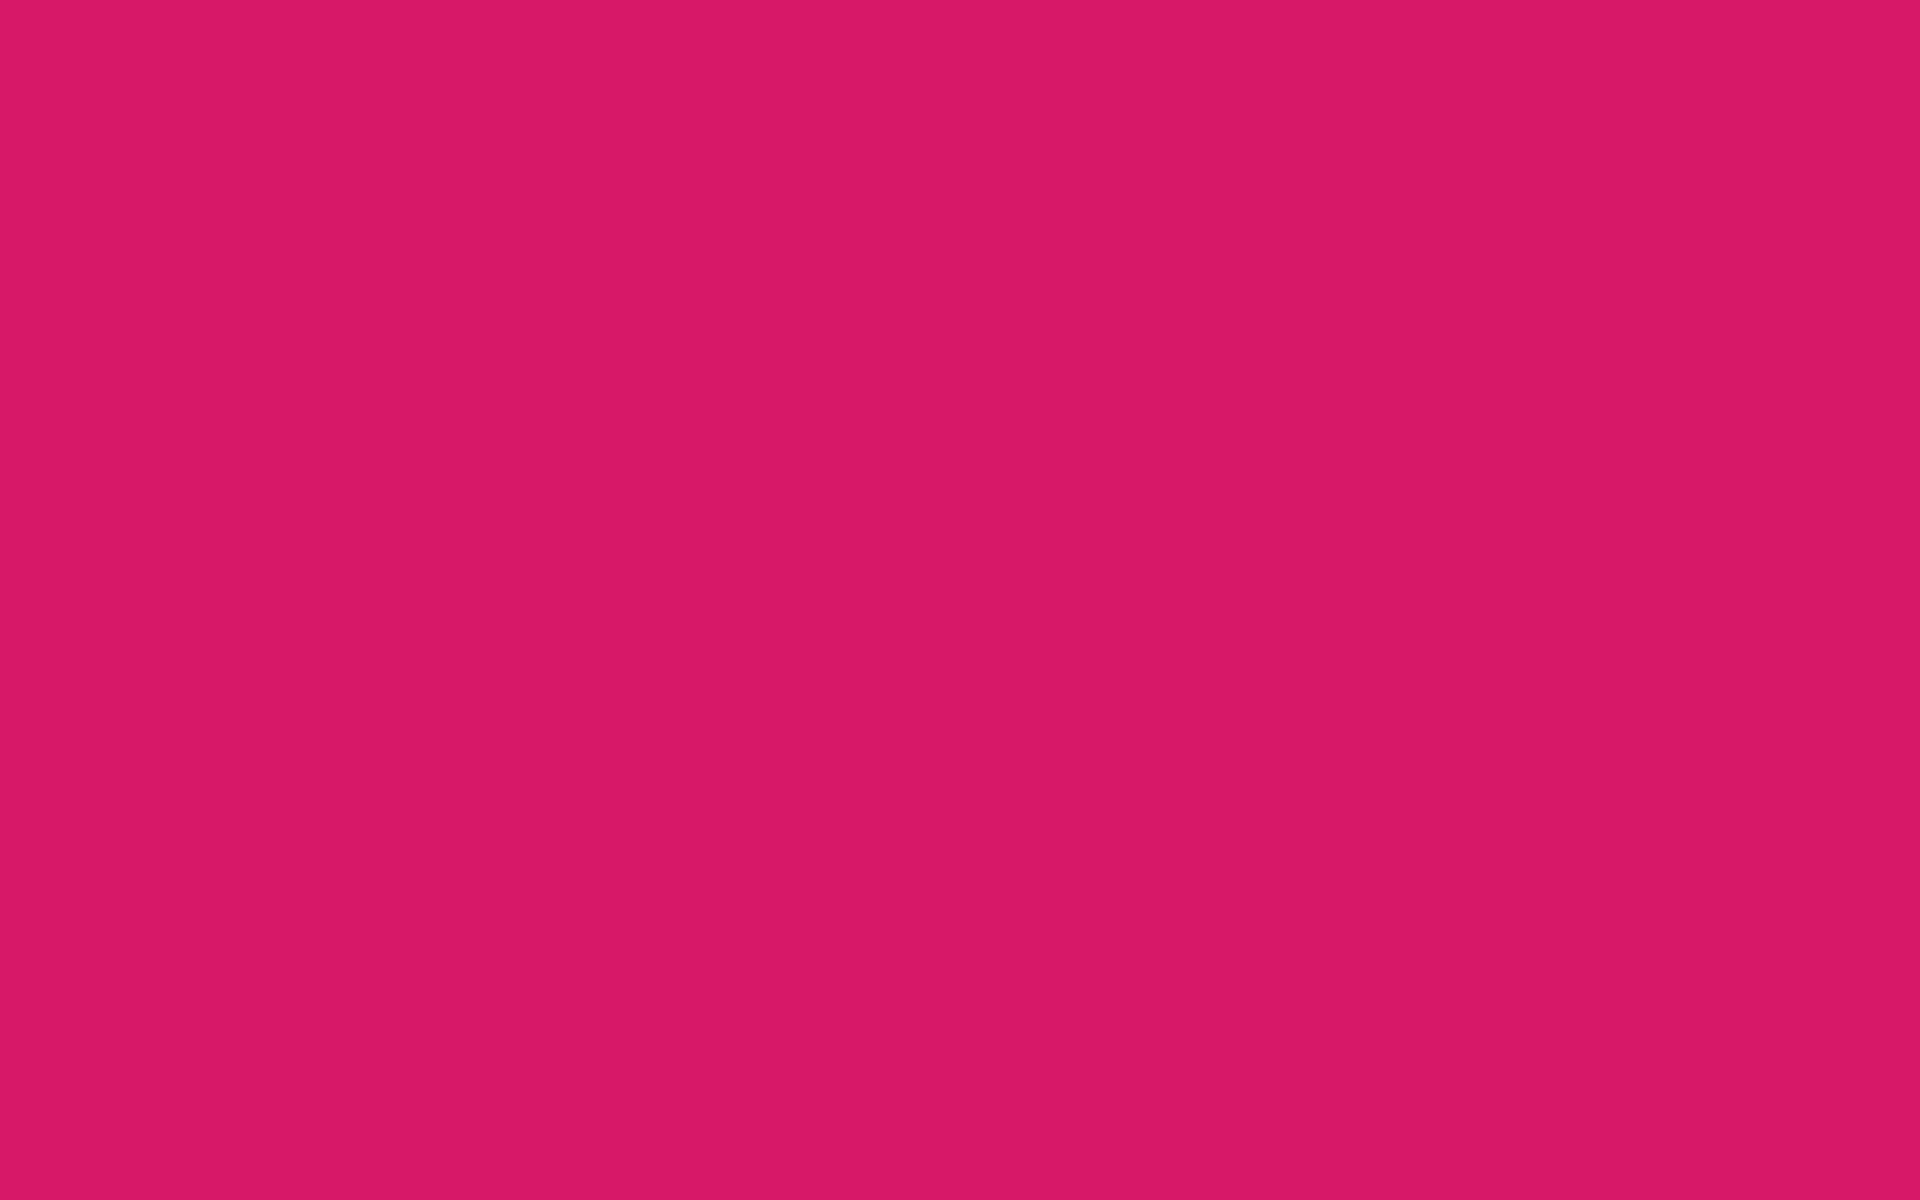 1920x1200 Dogwood Rose Solid Color Background